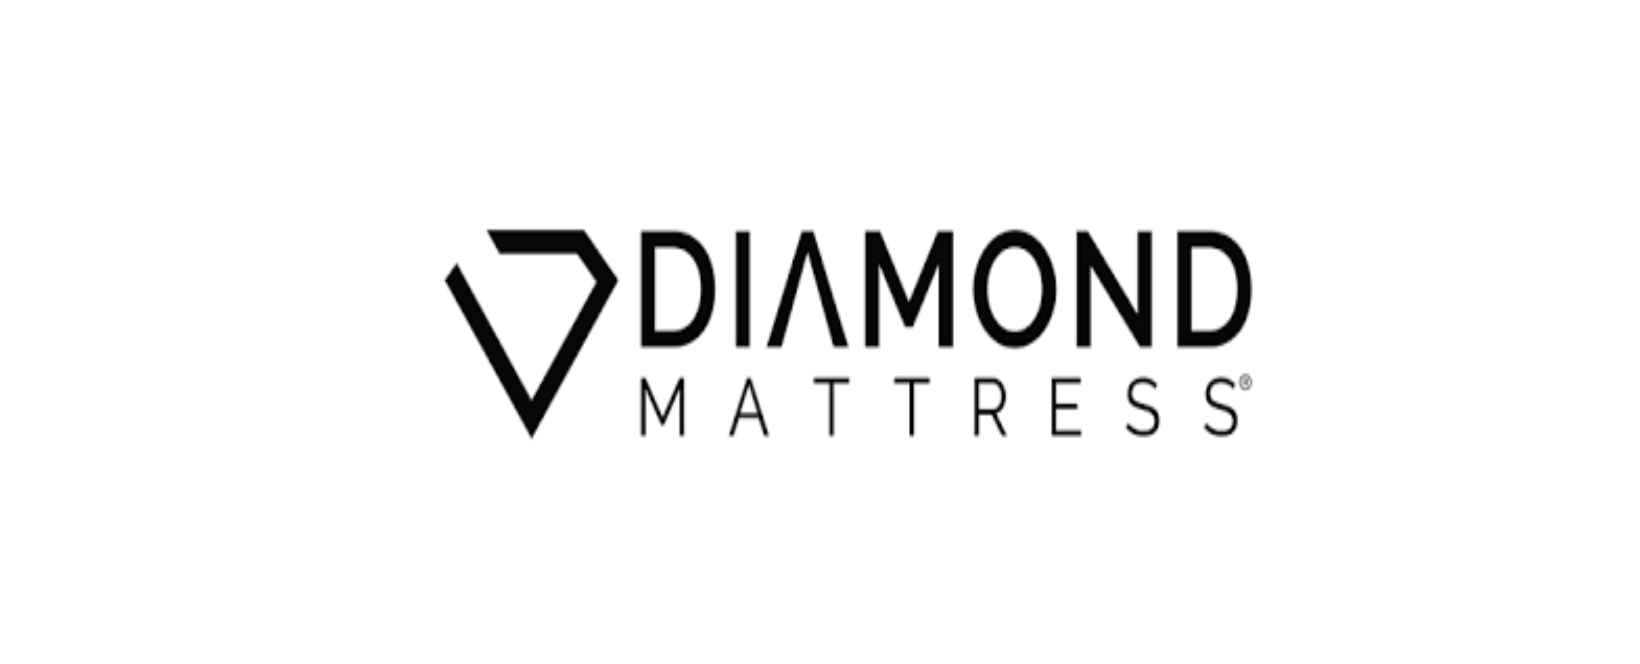 Diamond Mattress Discount Code 2021